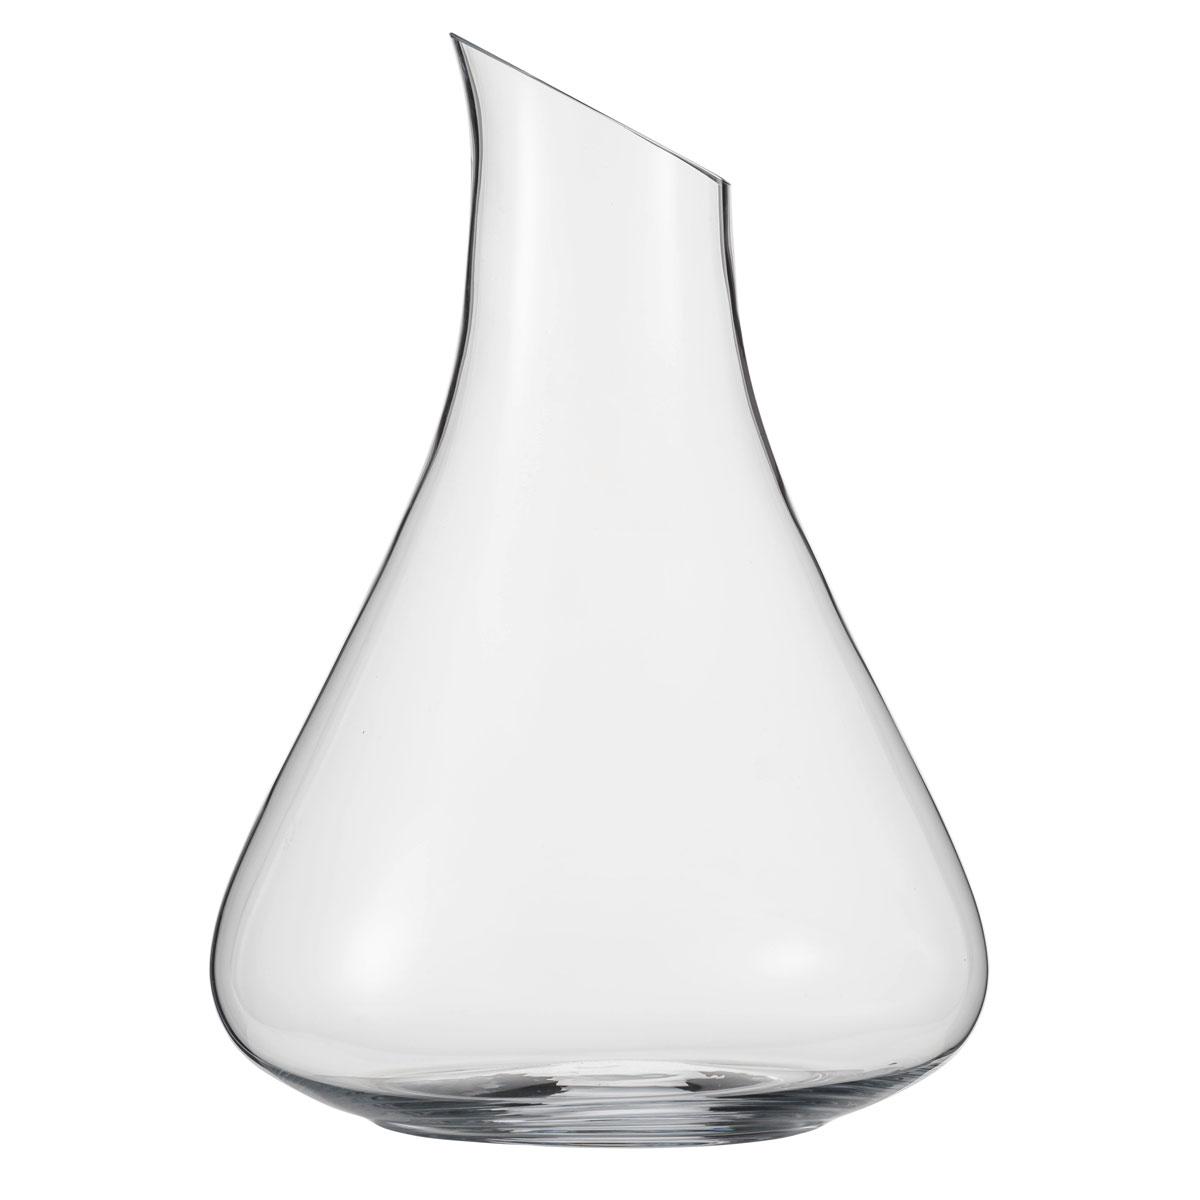 Schott Zwiesel Tritan Crystal, Air Red Wine Crystal Decanter